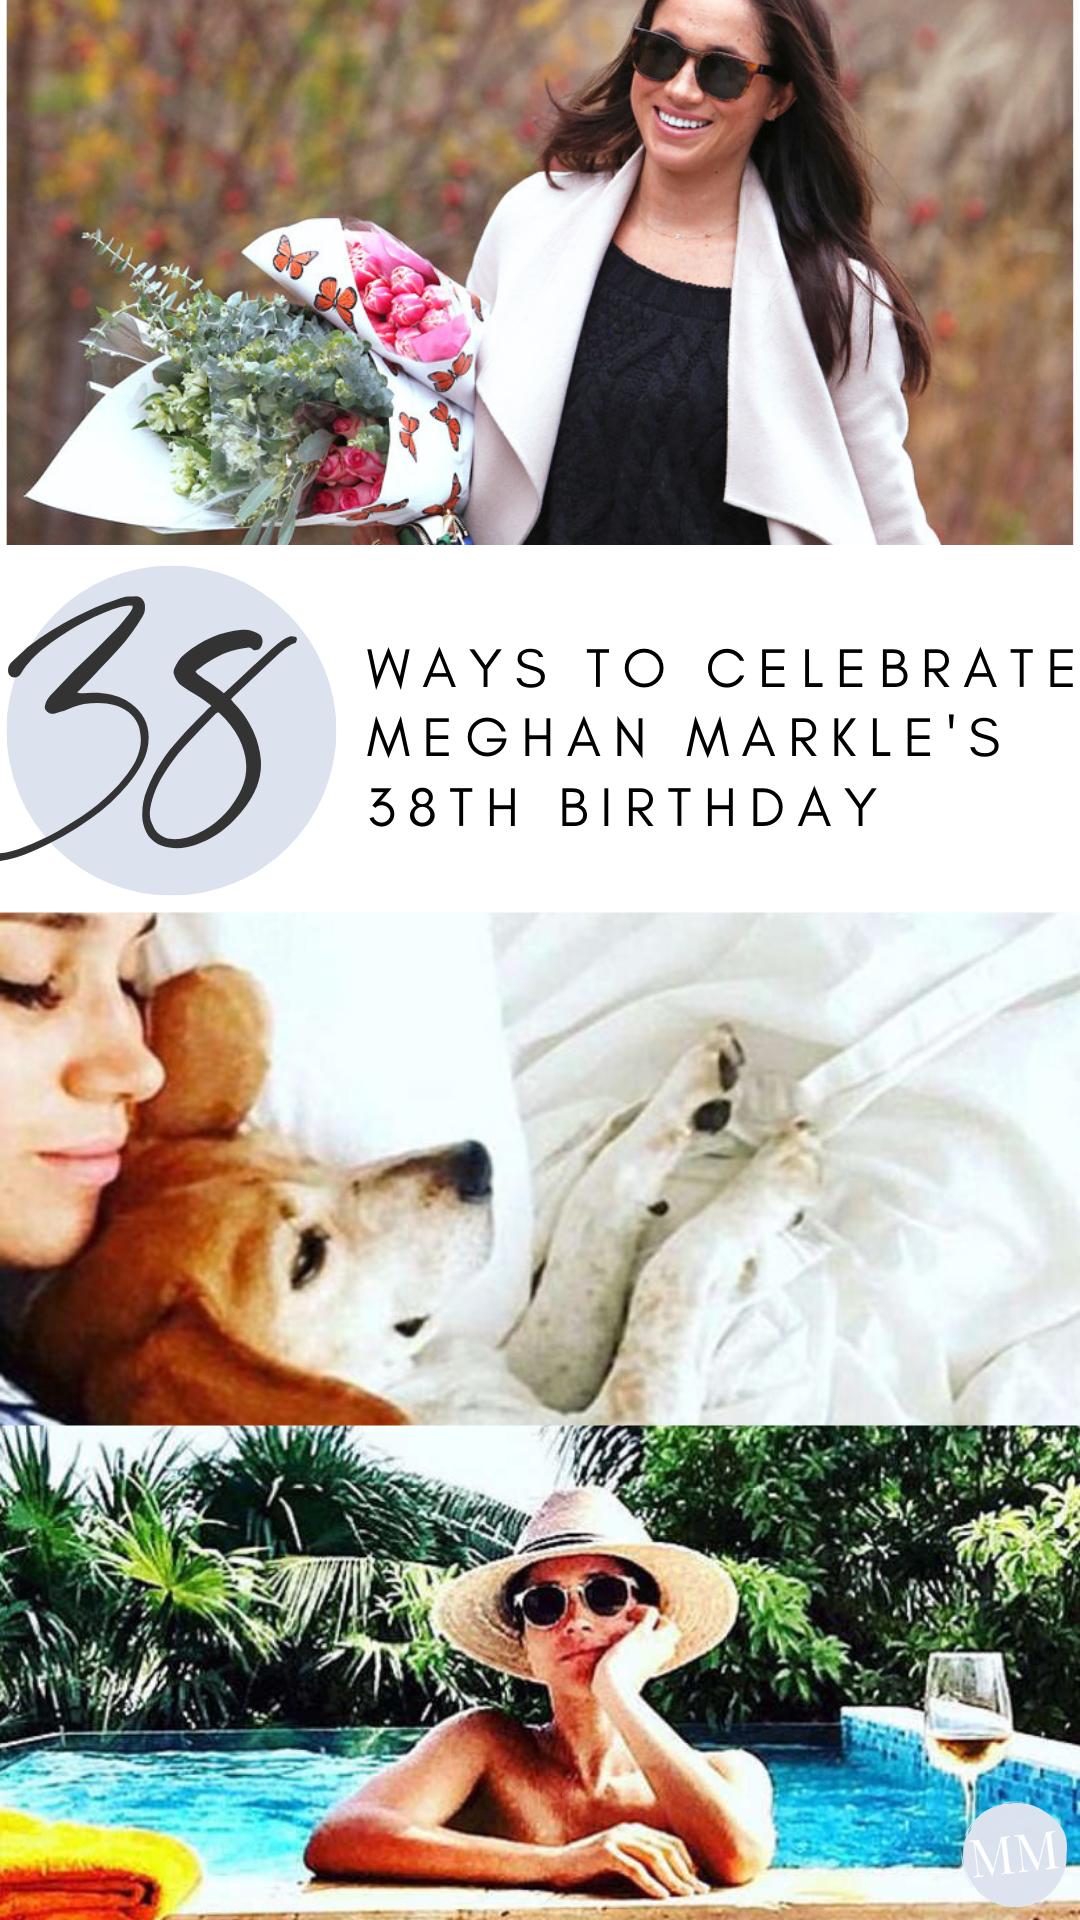 Meghan Markle Birthday 38